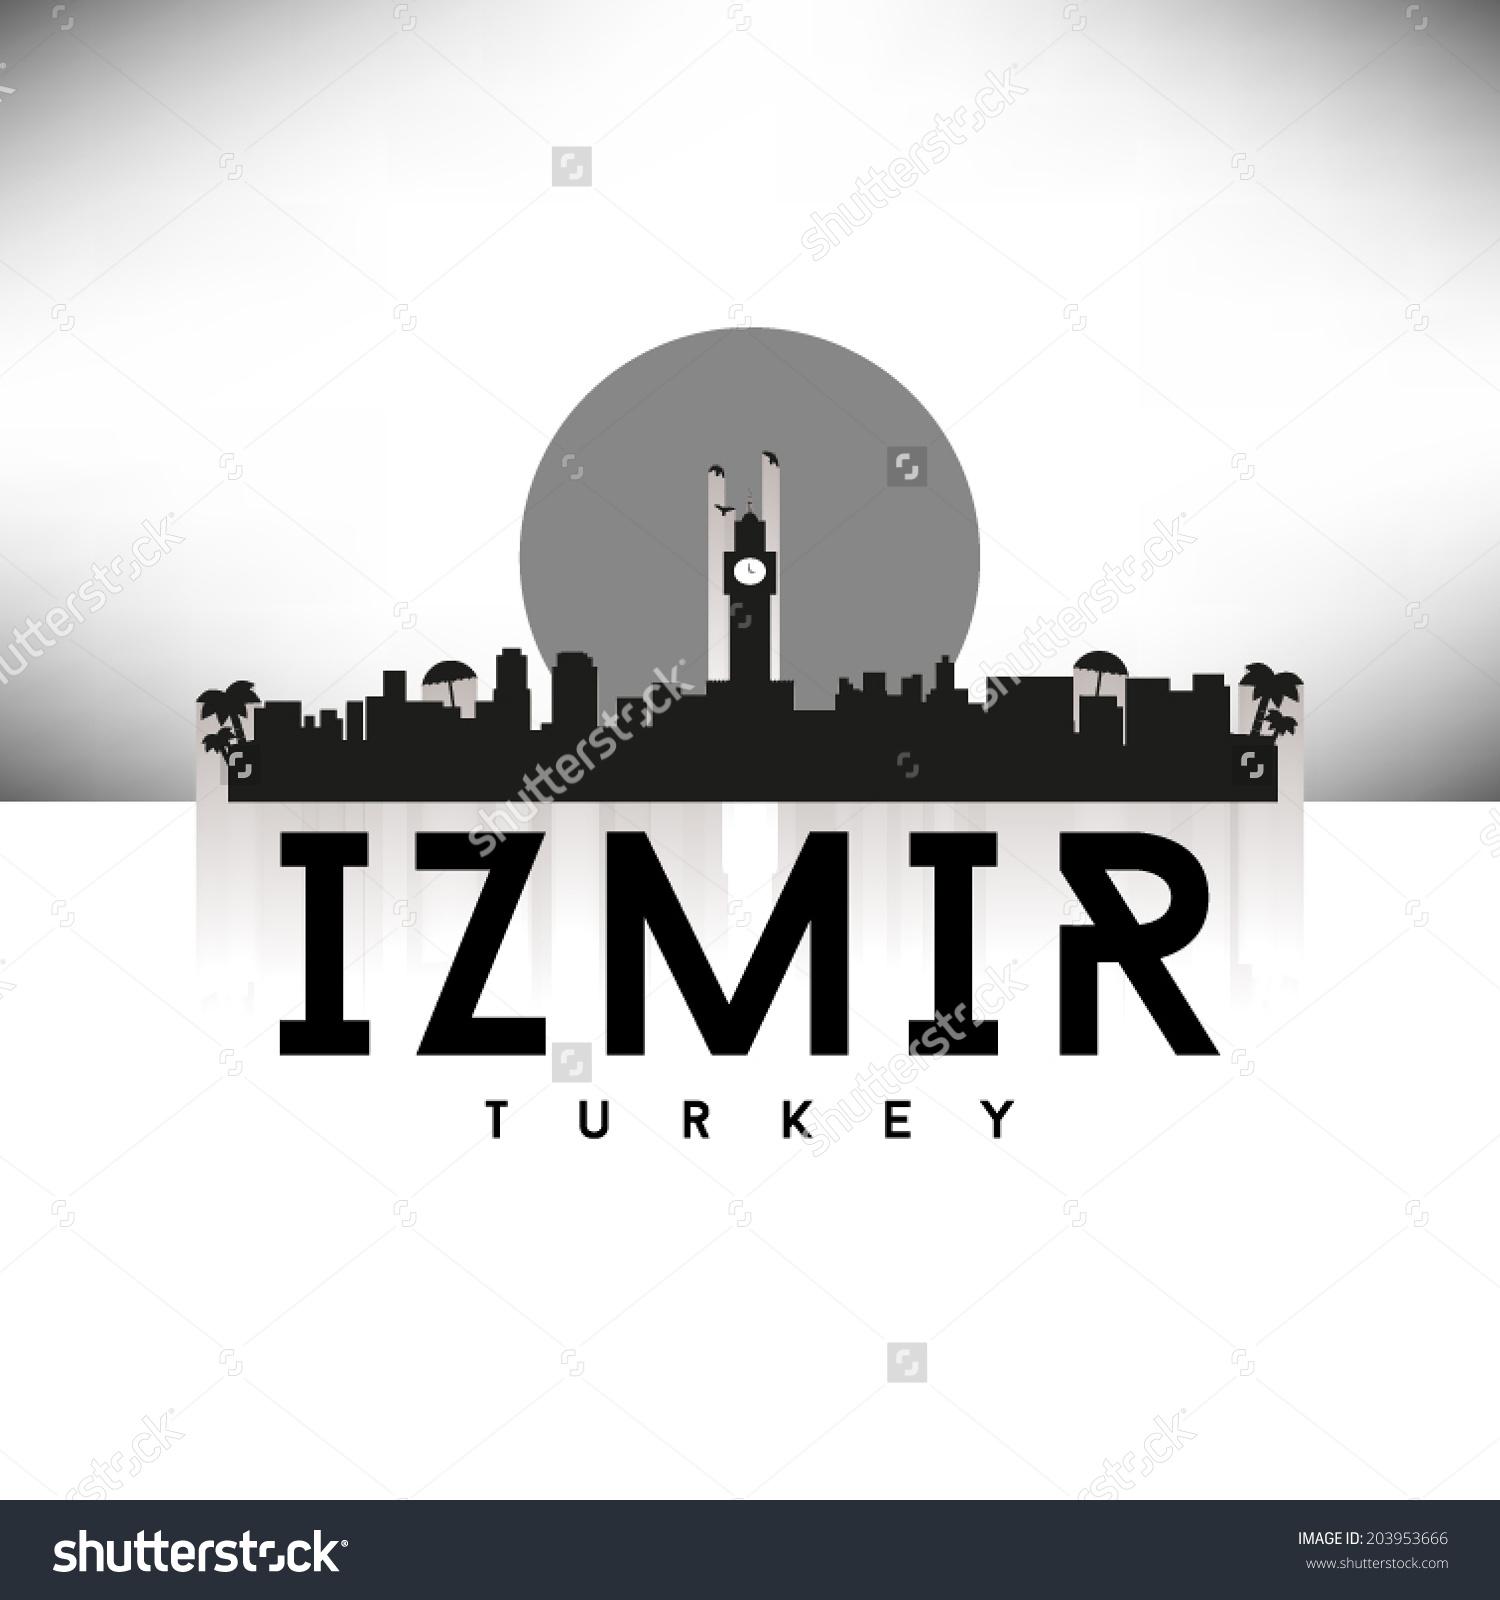 Izmir Turkey Skyline Silhouette Black White Stock Vector 203953666.